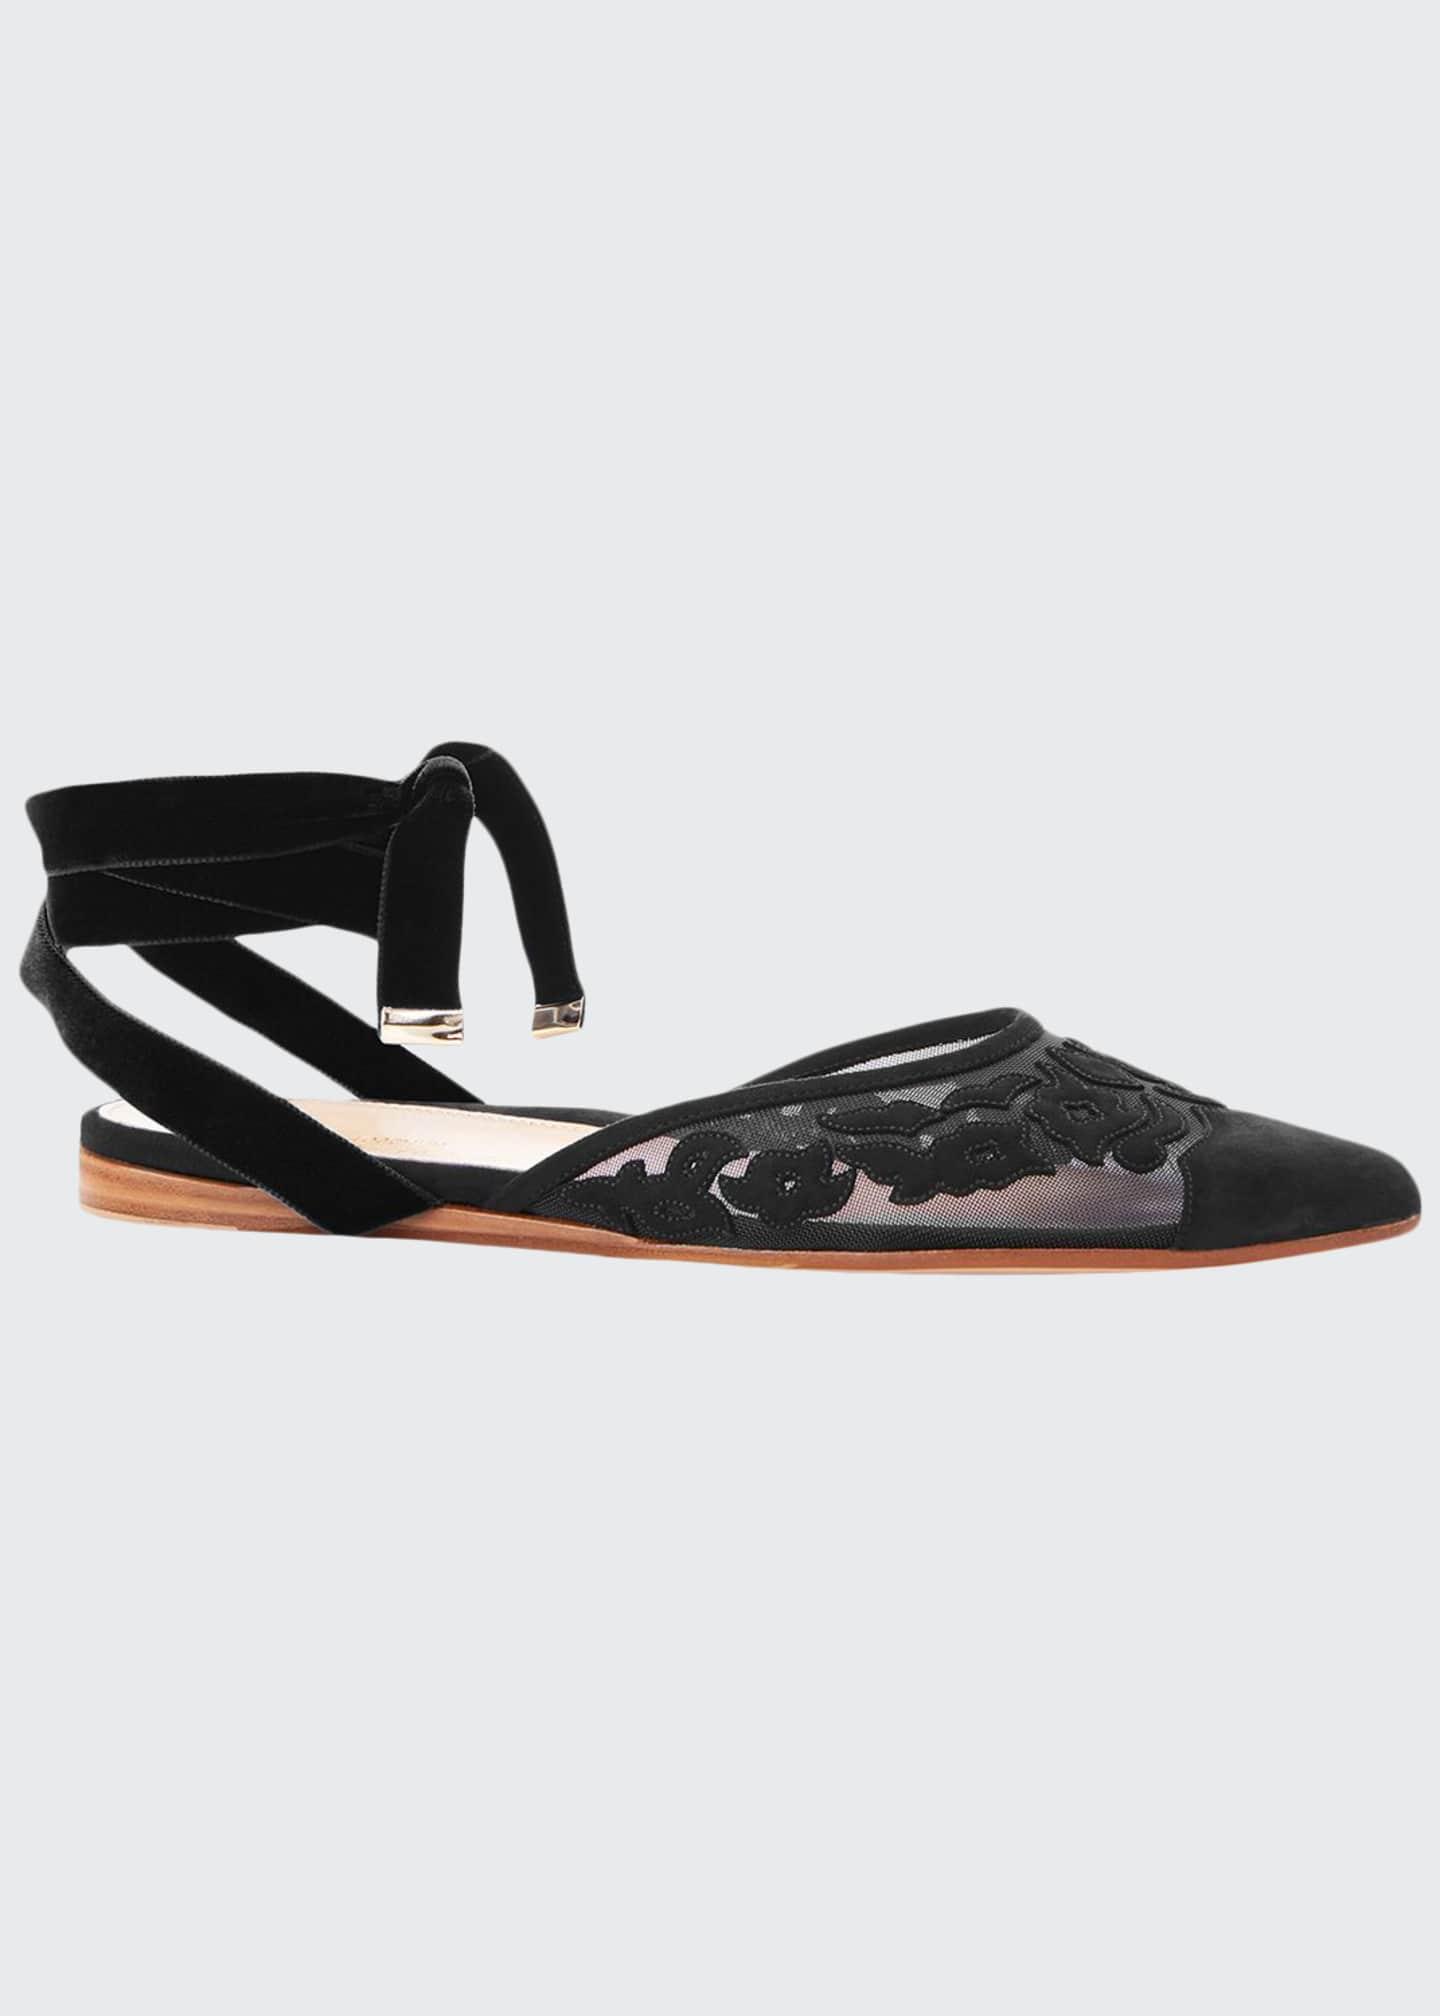 Marion Parke Naomi Ankle-Tie Suede Flats